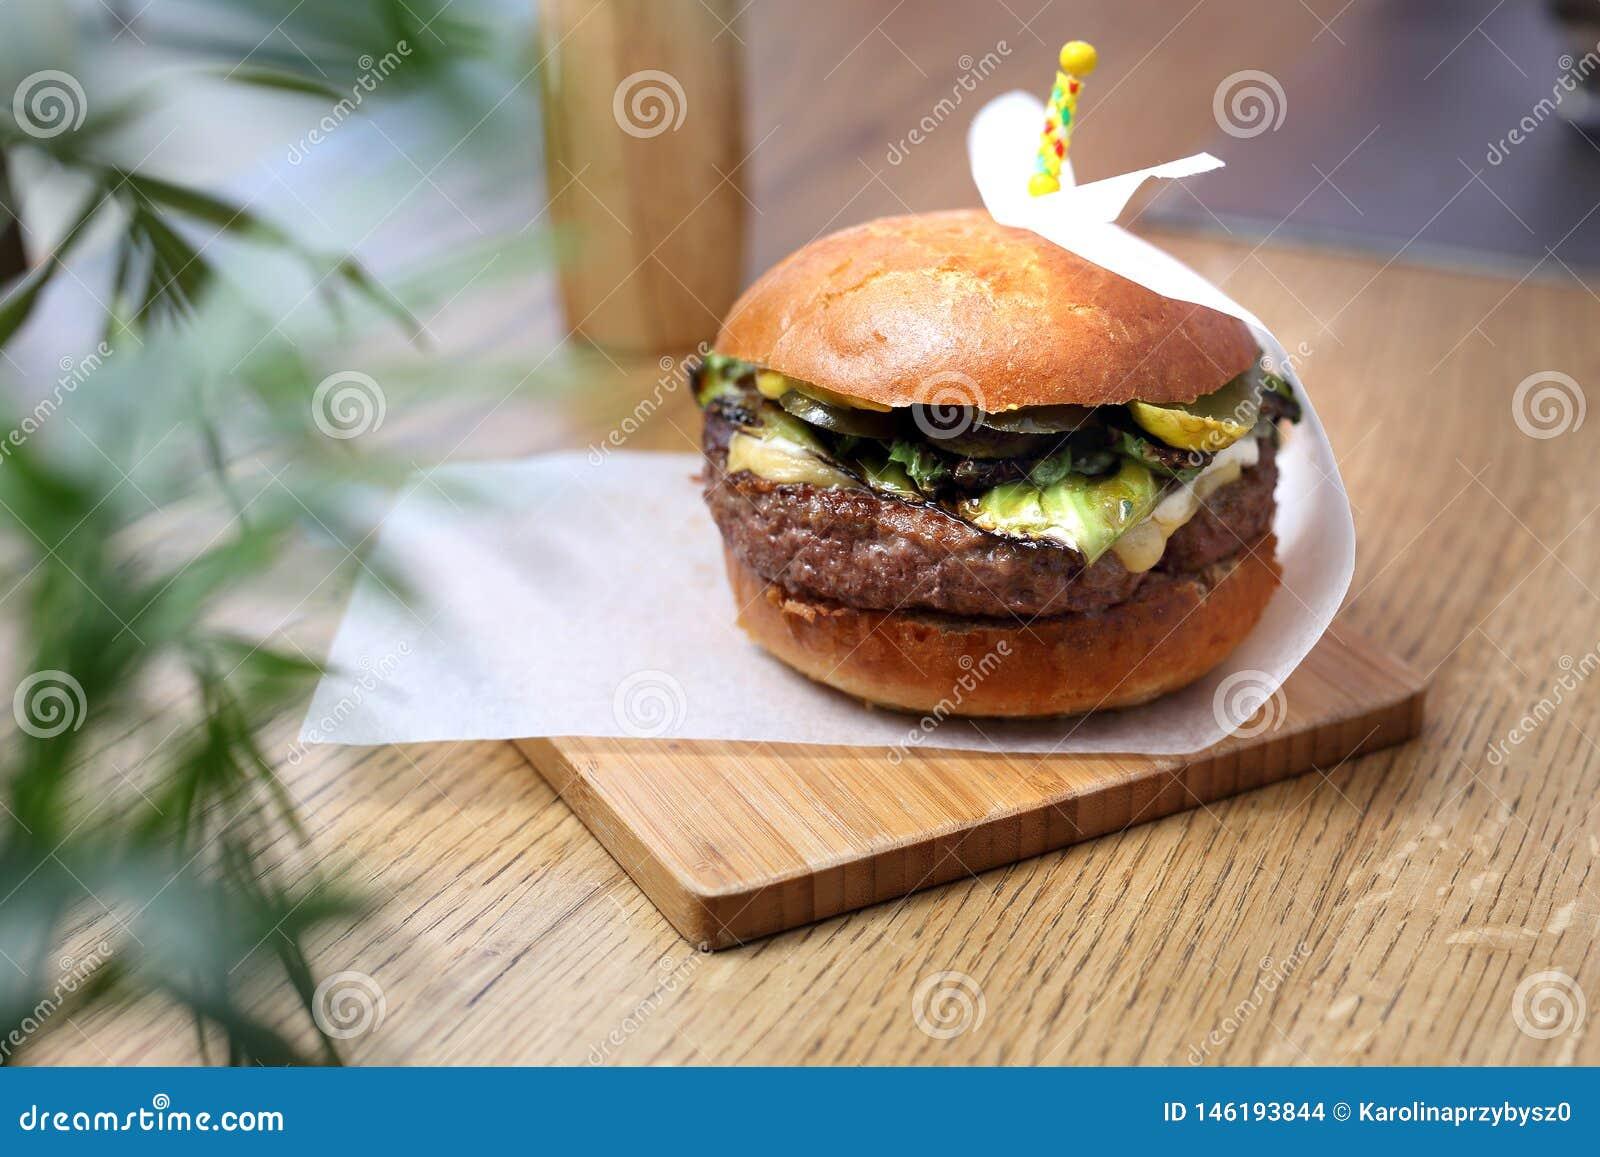 Burger με cutlet βόειου κρέατος με την πράσινη σαλάτα και τα ψημένα στη σχάρα πράσινα λαχανικά